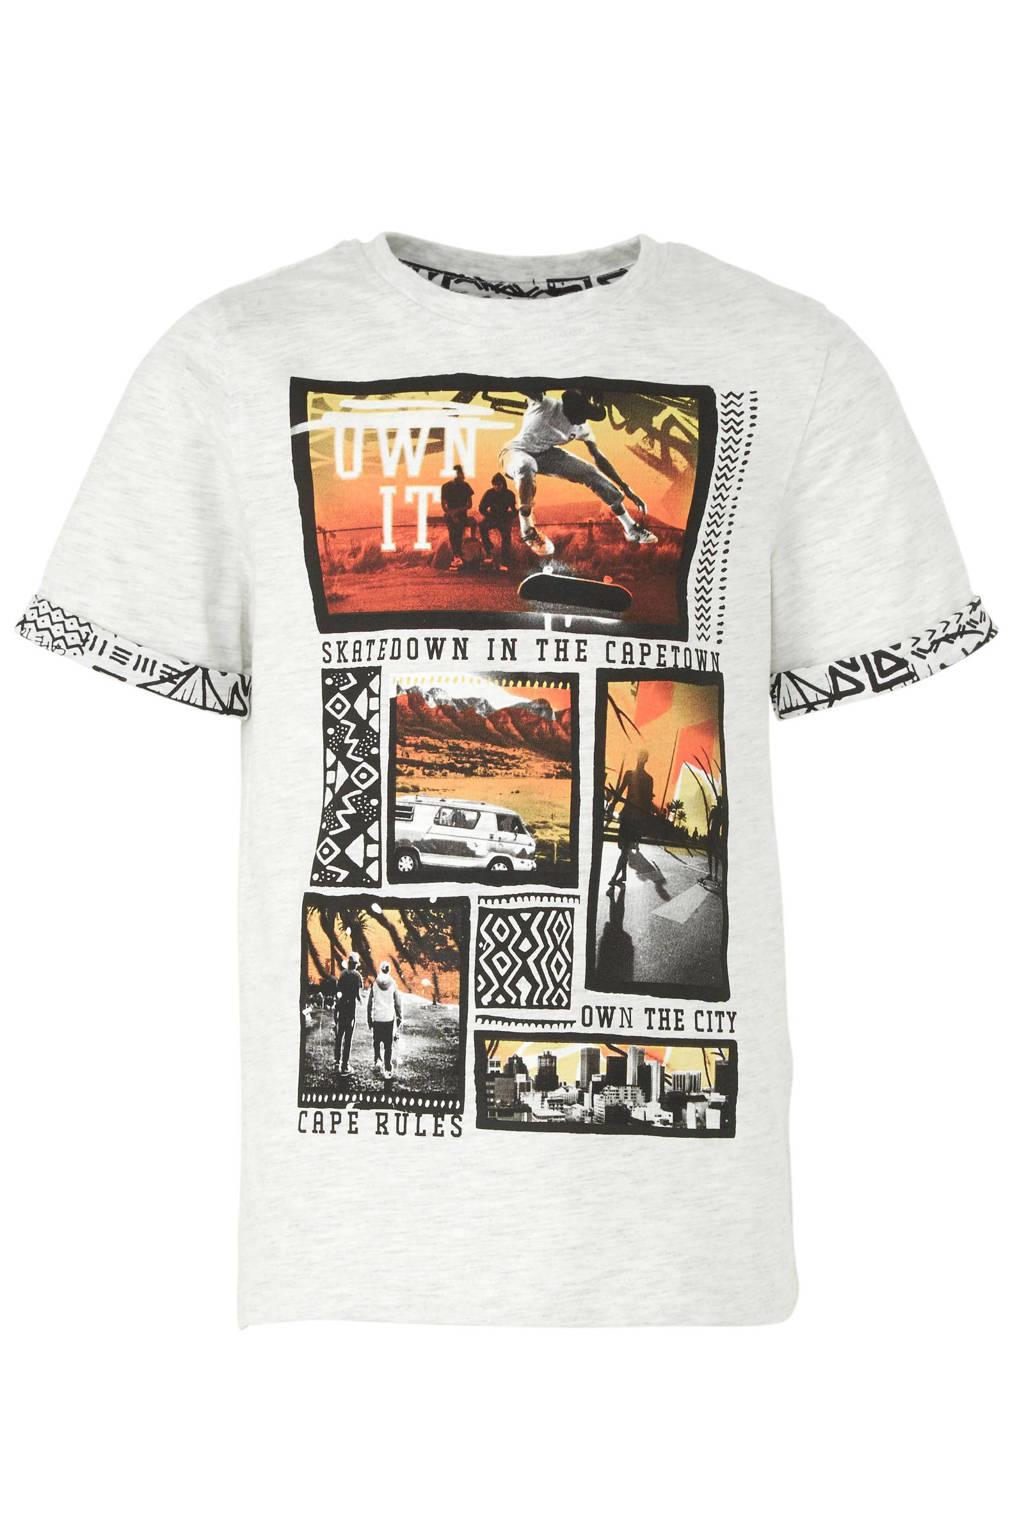 C&A Here & There T-shirt met printopdruk grijs, Lichtgrijs melange